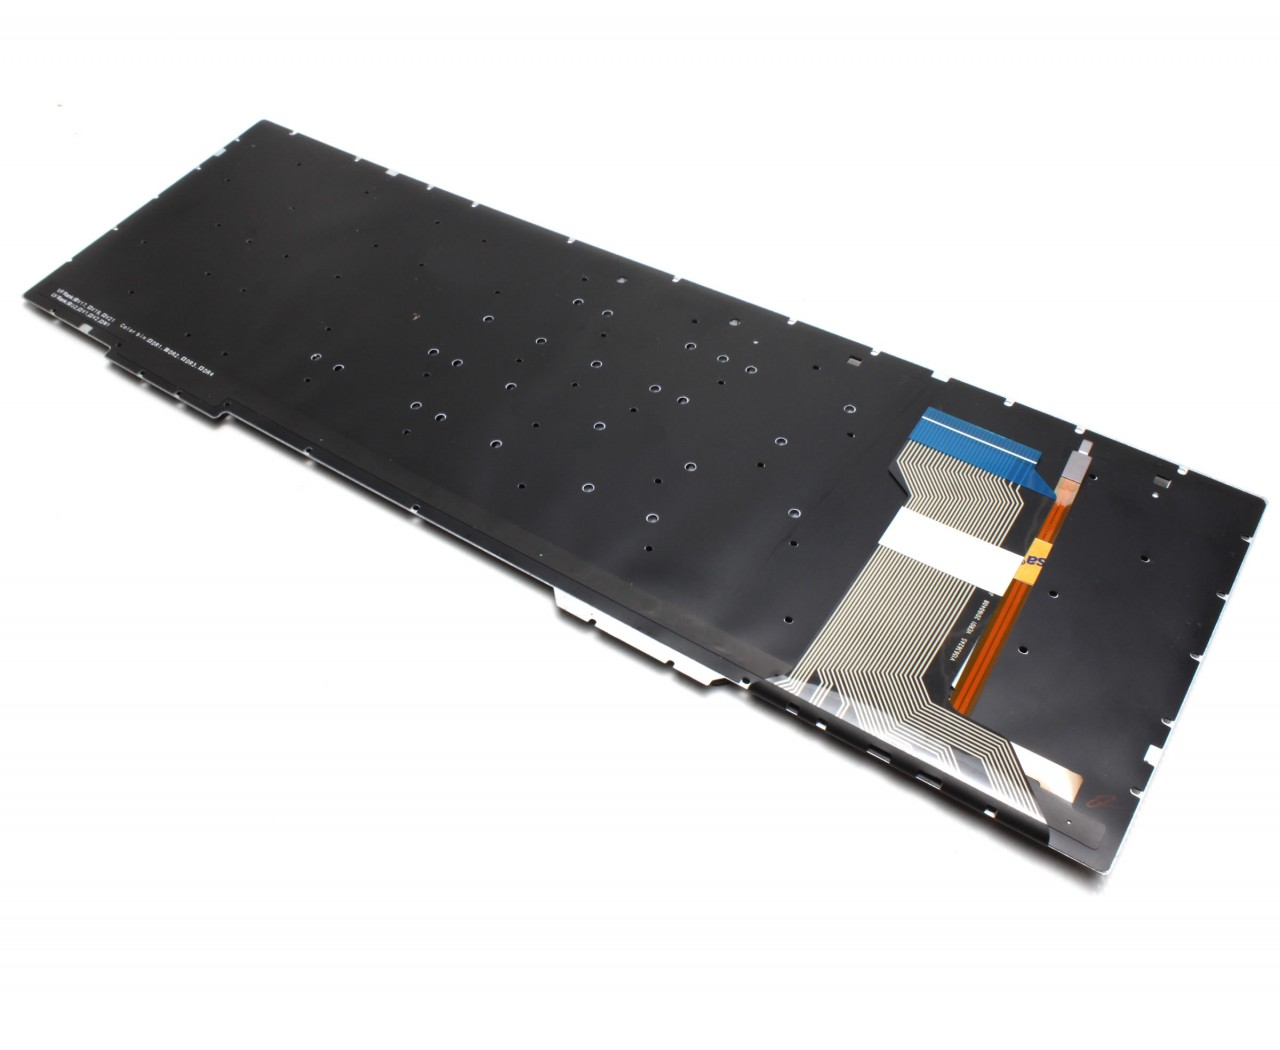 Tastatura Asus FX53VD iluminata layout US fara rama enter mic imagine powerlaptop.ro 2021